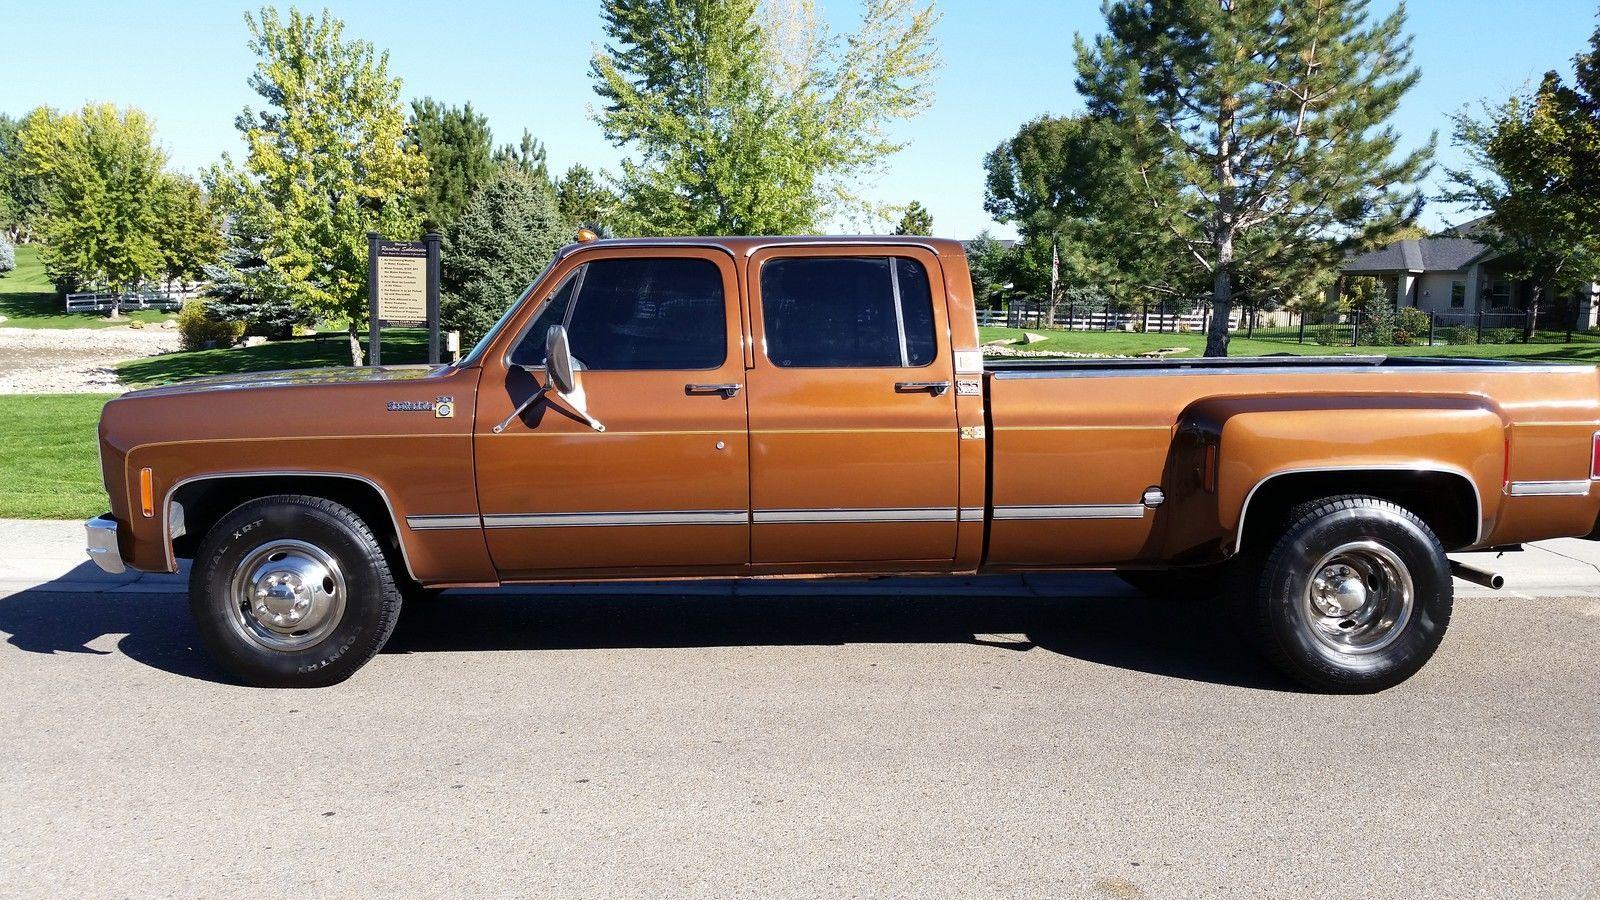 ford lifted for door doors crew sale duty pickup lariat f cab trucks super